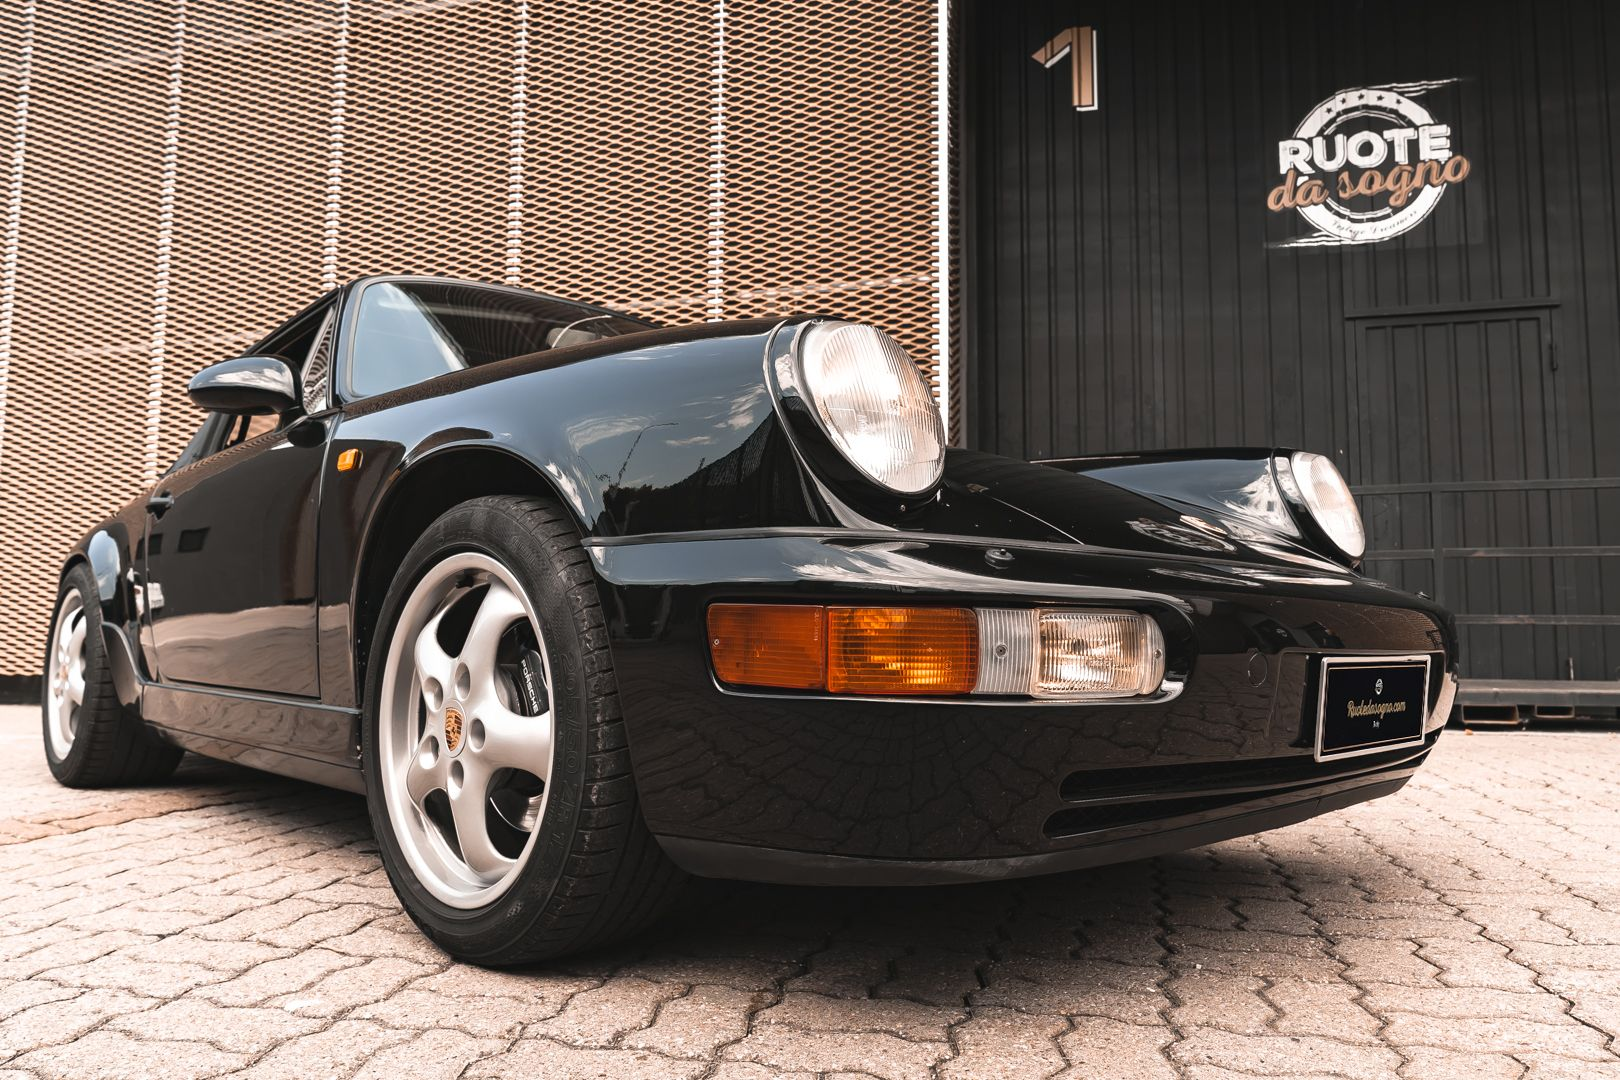 1991 Porsche 911/964 Carrera 4 79221